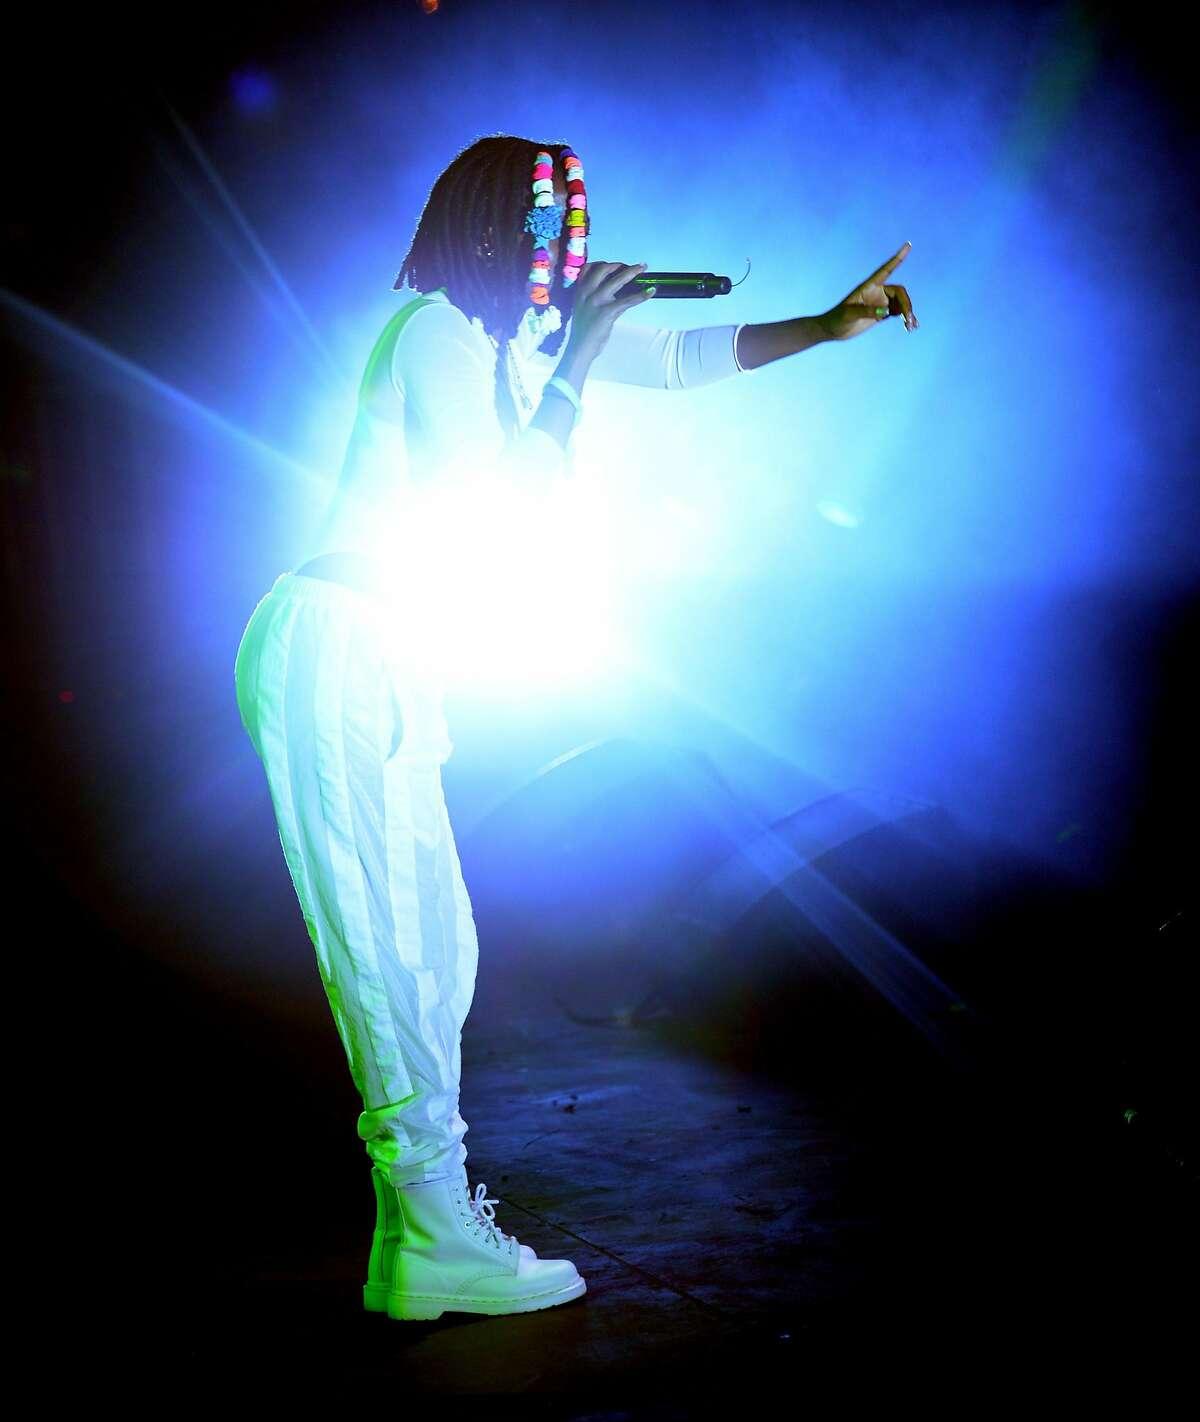 Singer Kelela performs onstage during FYF Fest 2016 at Los Angeles Sports Arena.